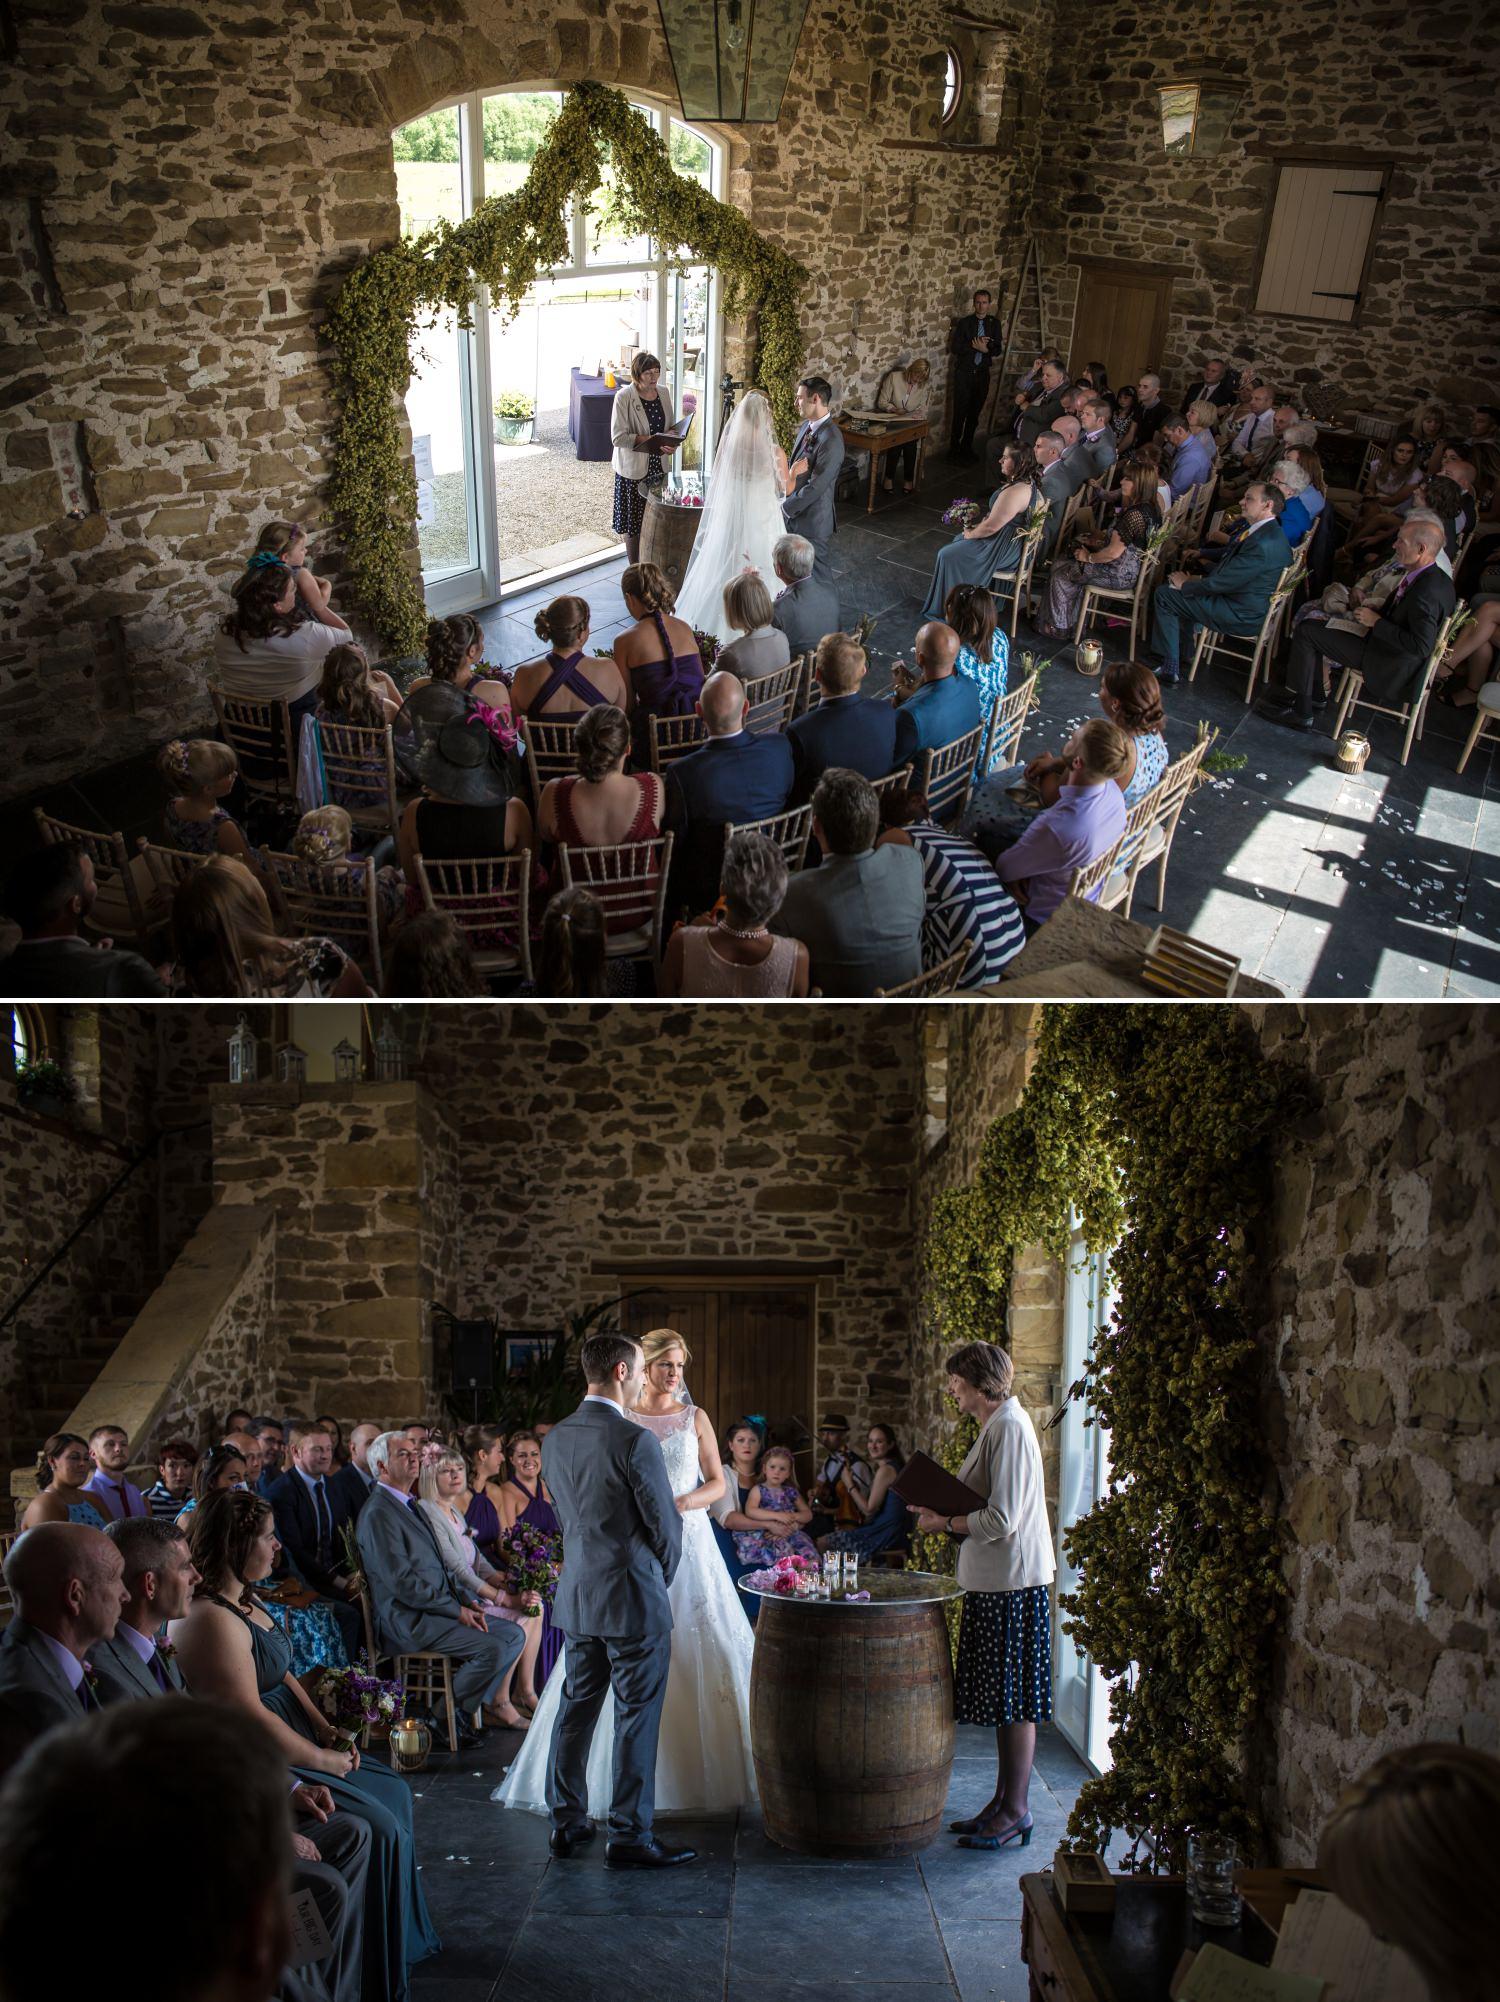 Wedding ceremony photographer at Pentrehobyn Hall